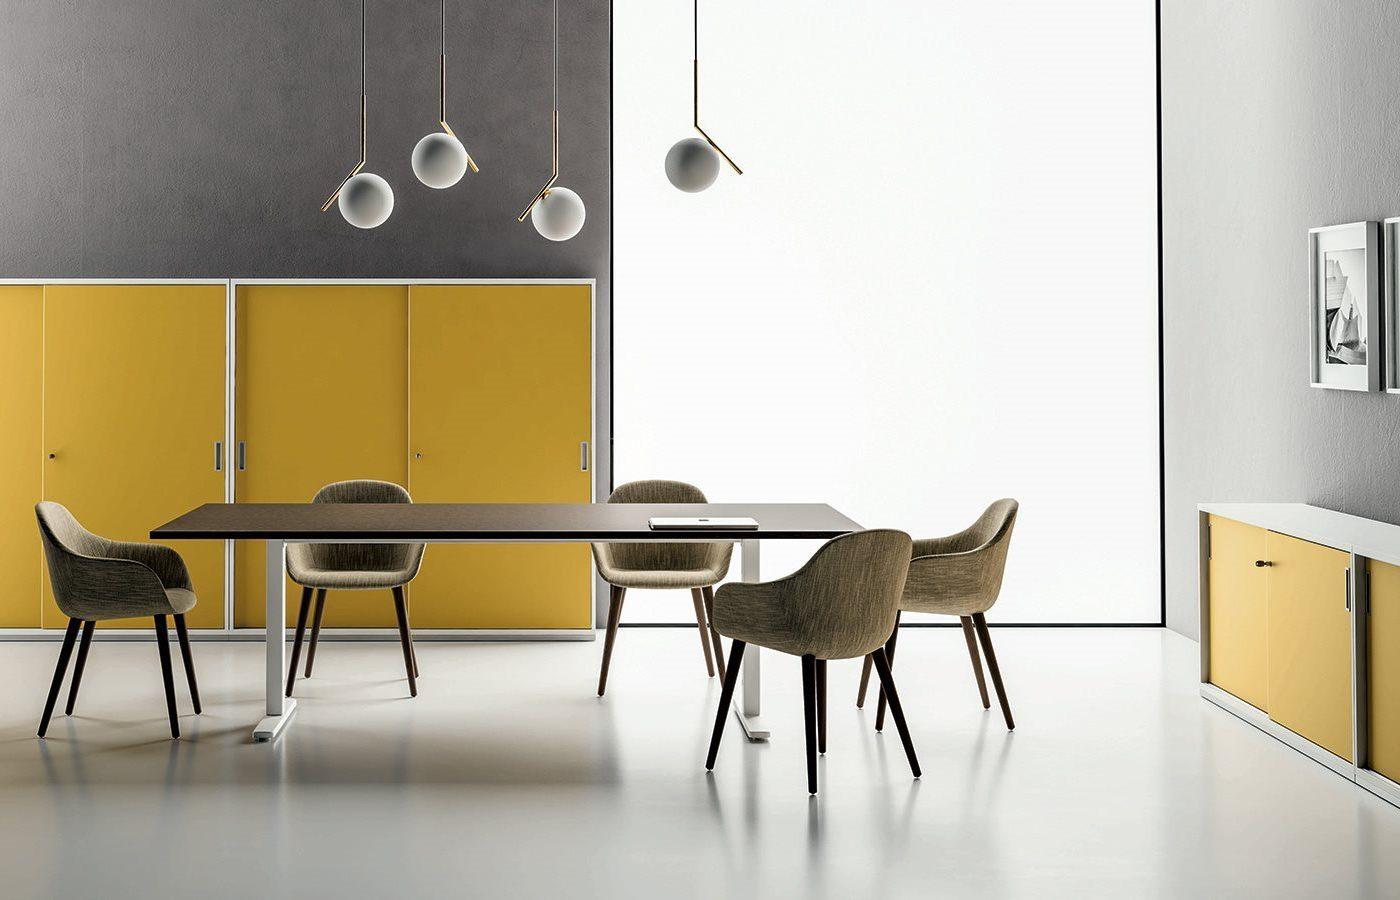 dvo_tavoli_DV990_workstation-table_gallery_9_zoom